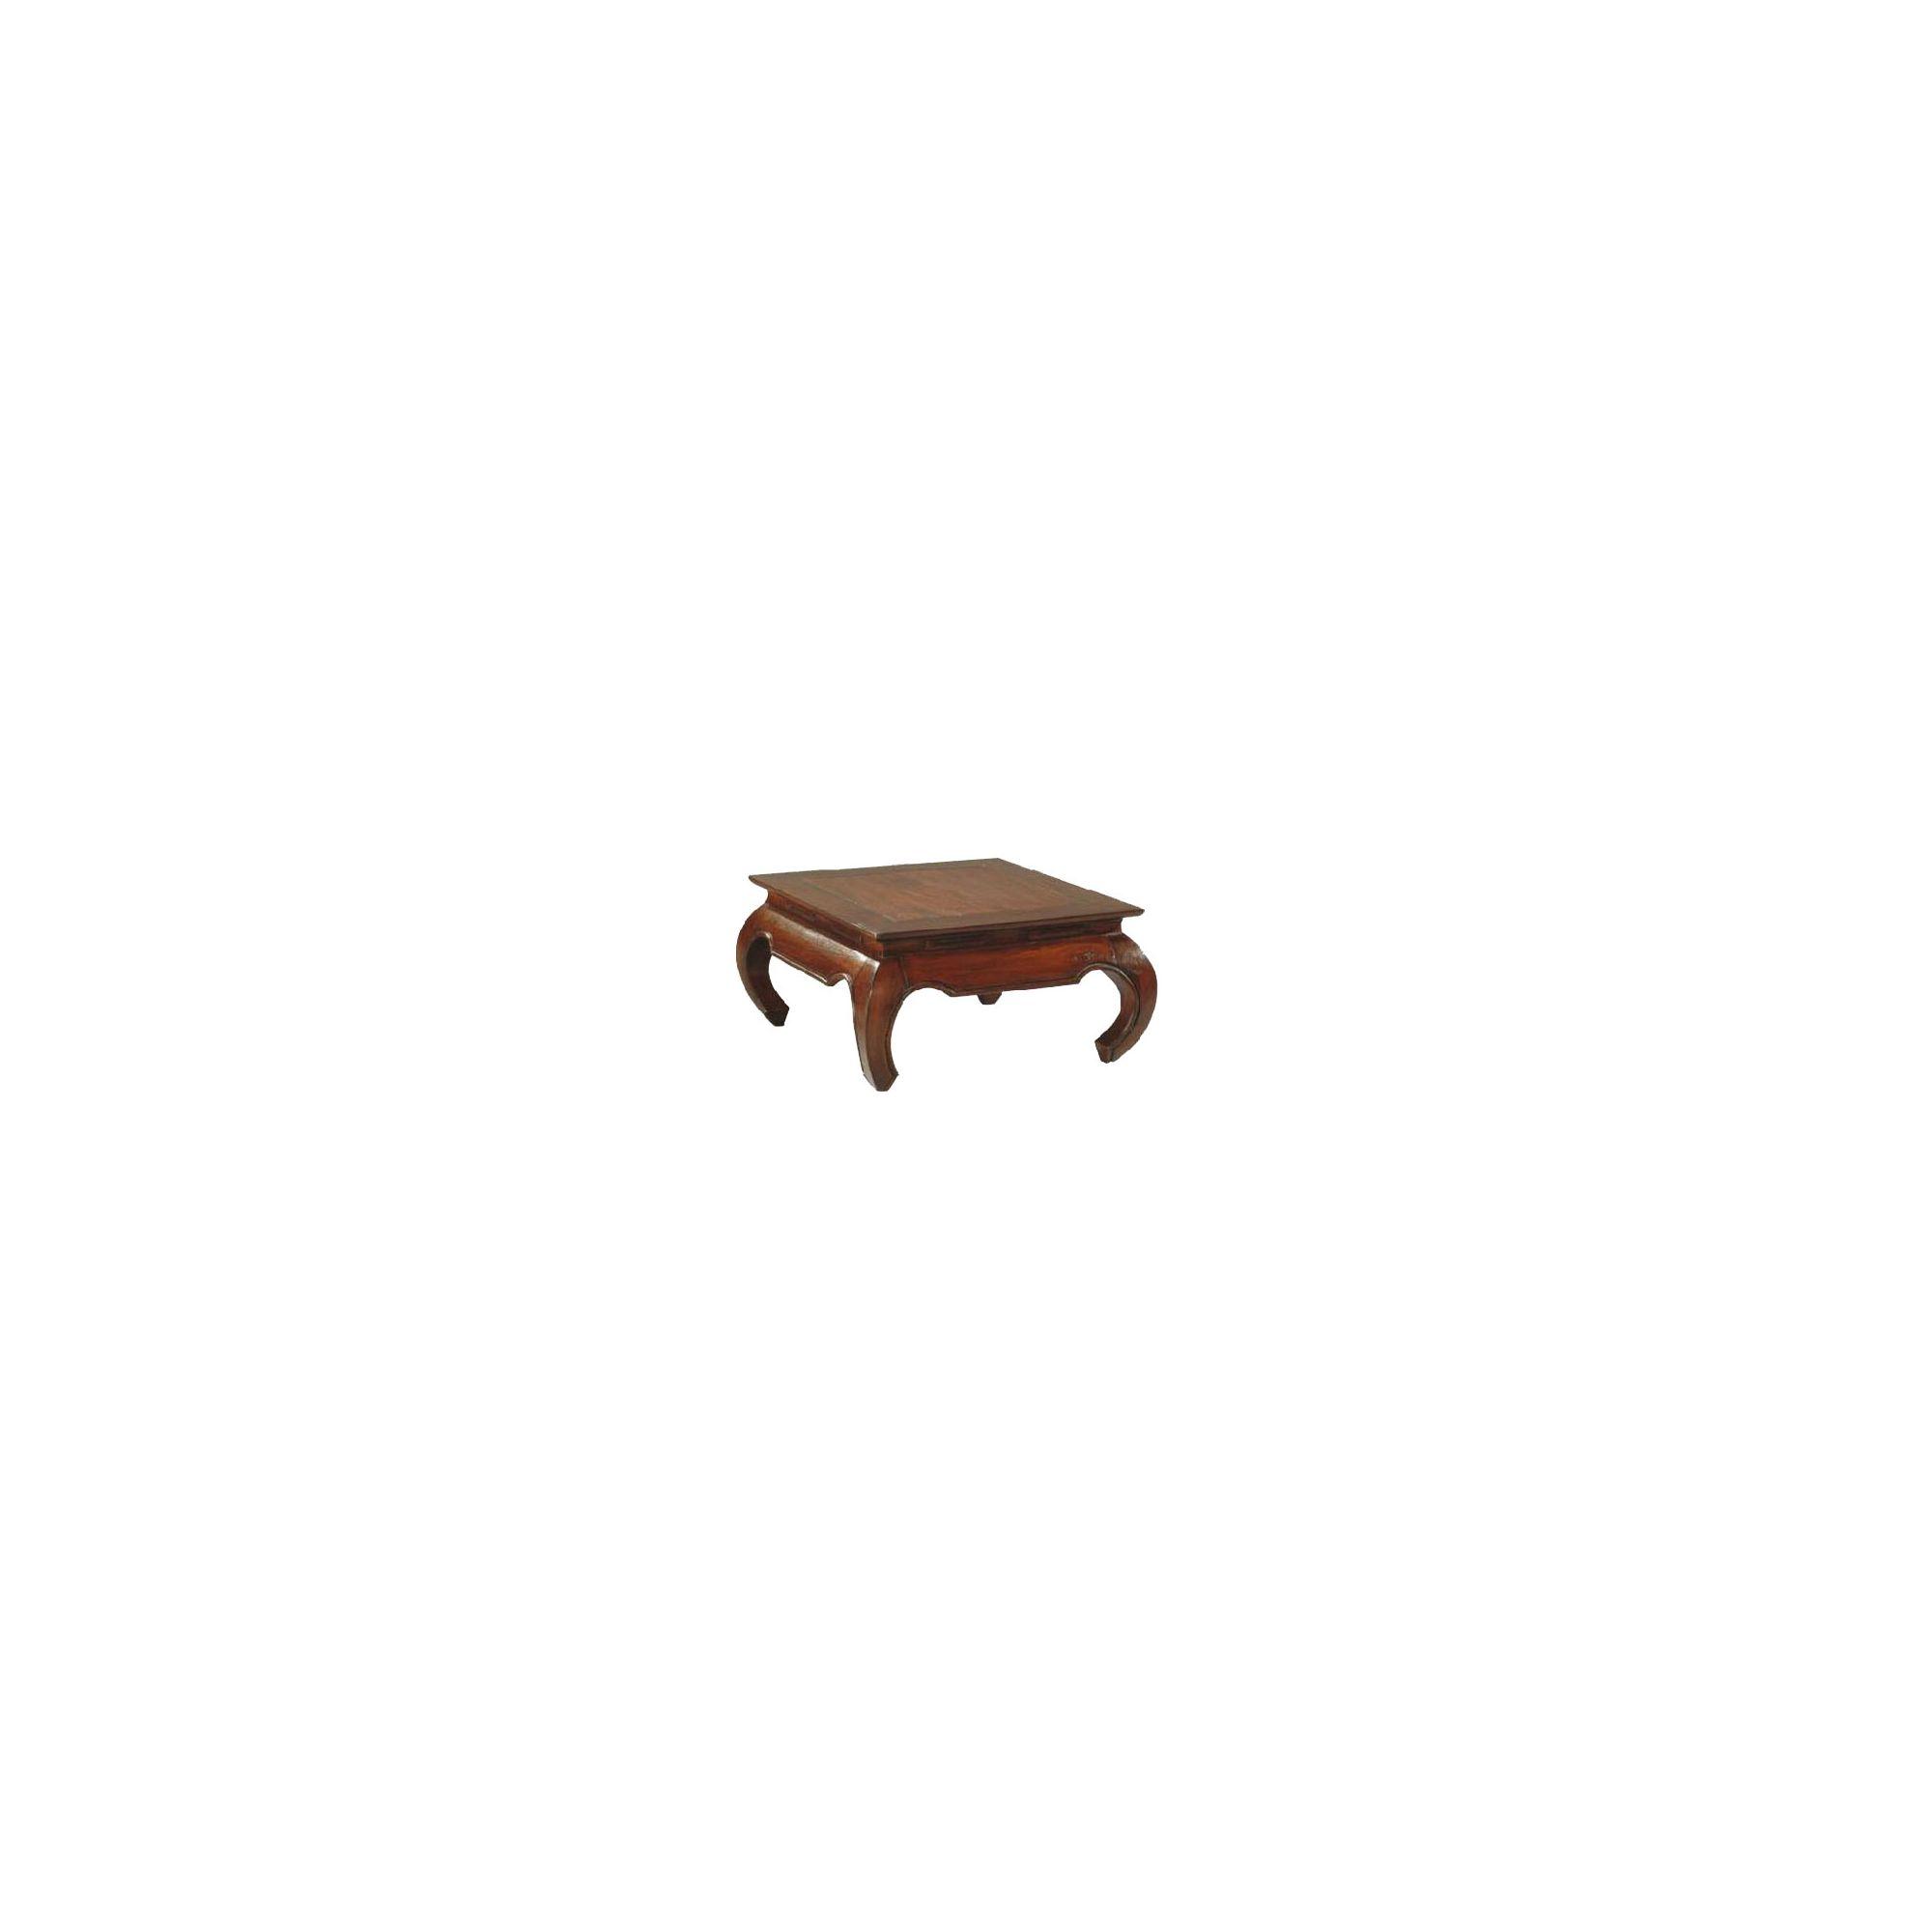 Altruna Osia Coffee Table - 35cm x 70cm x 70cm